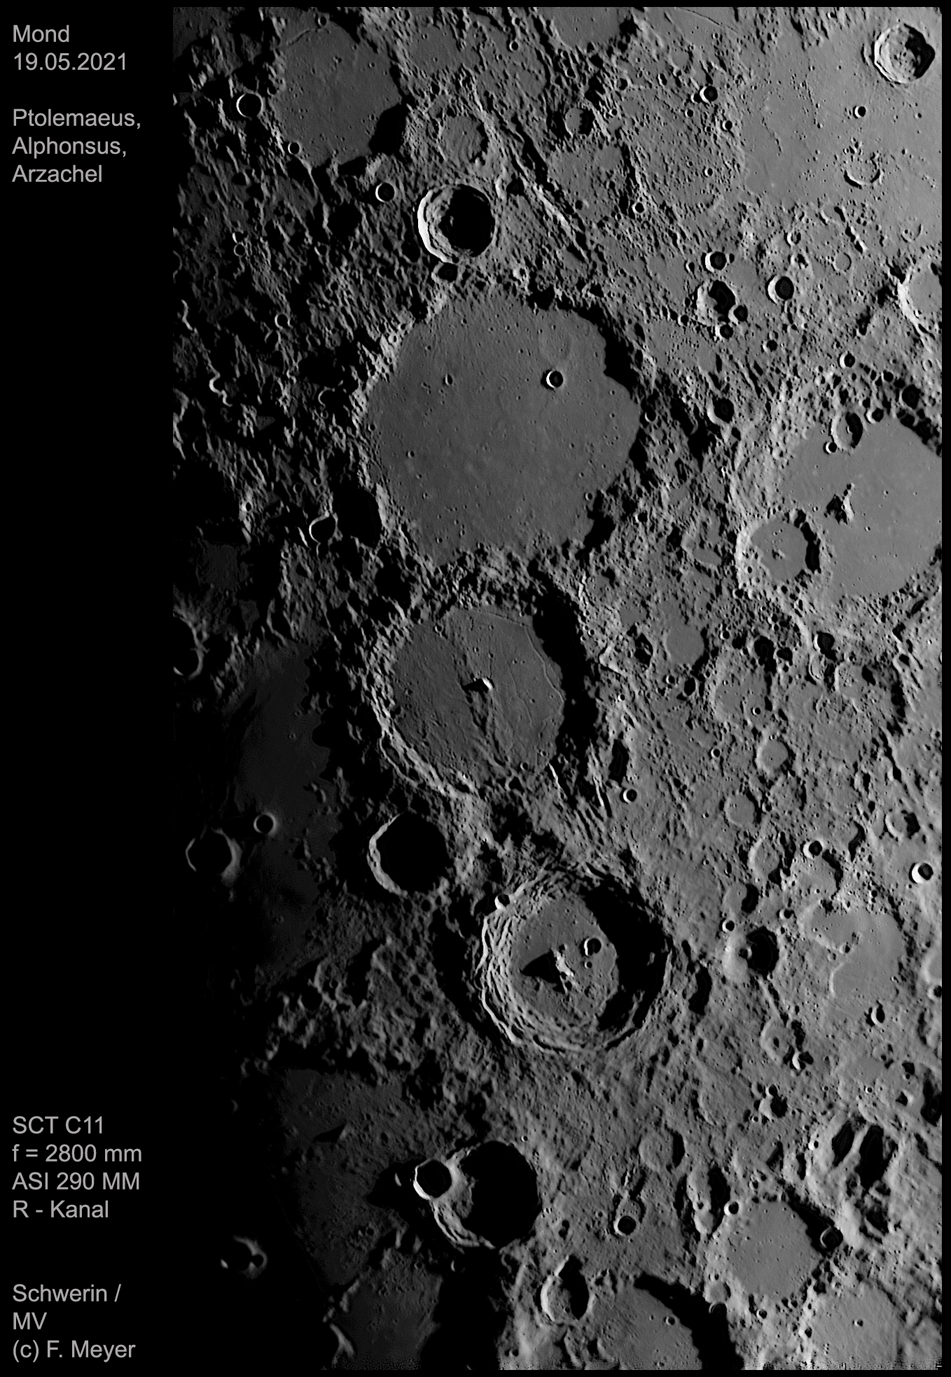 Ptolemaeus, Alphonsus, Arzachel am 19.05.2021